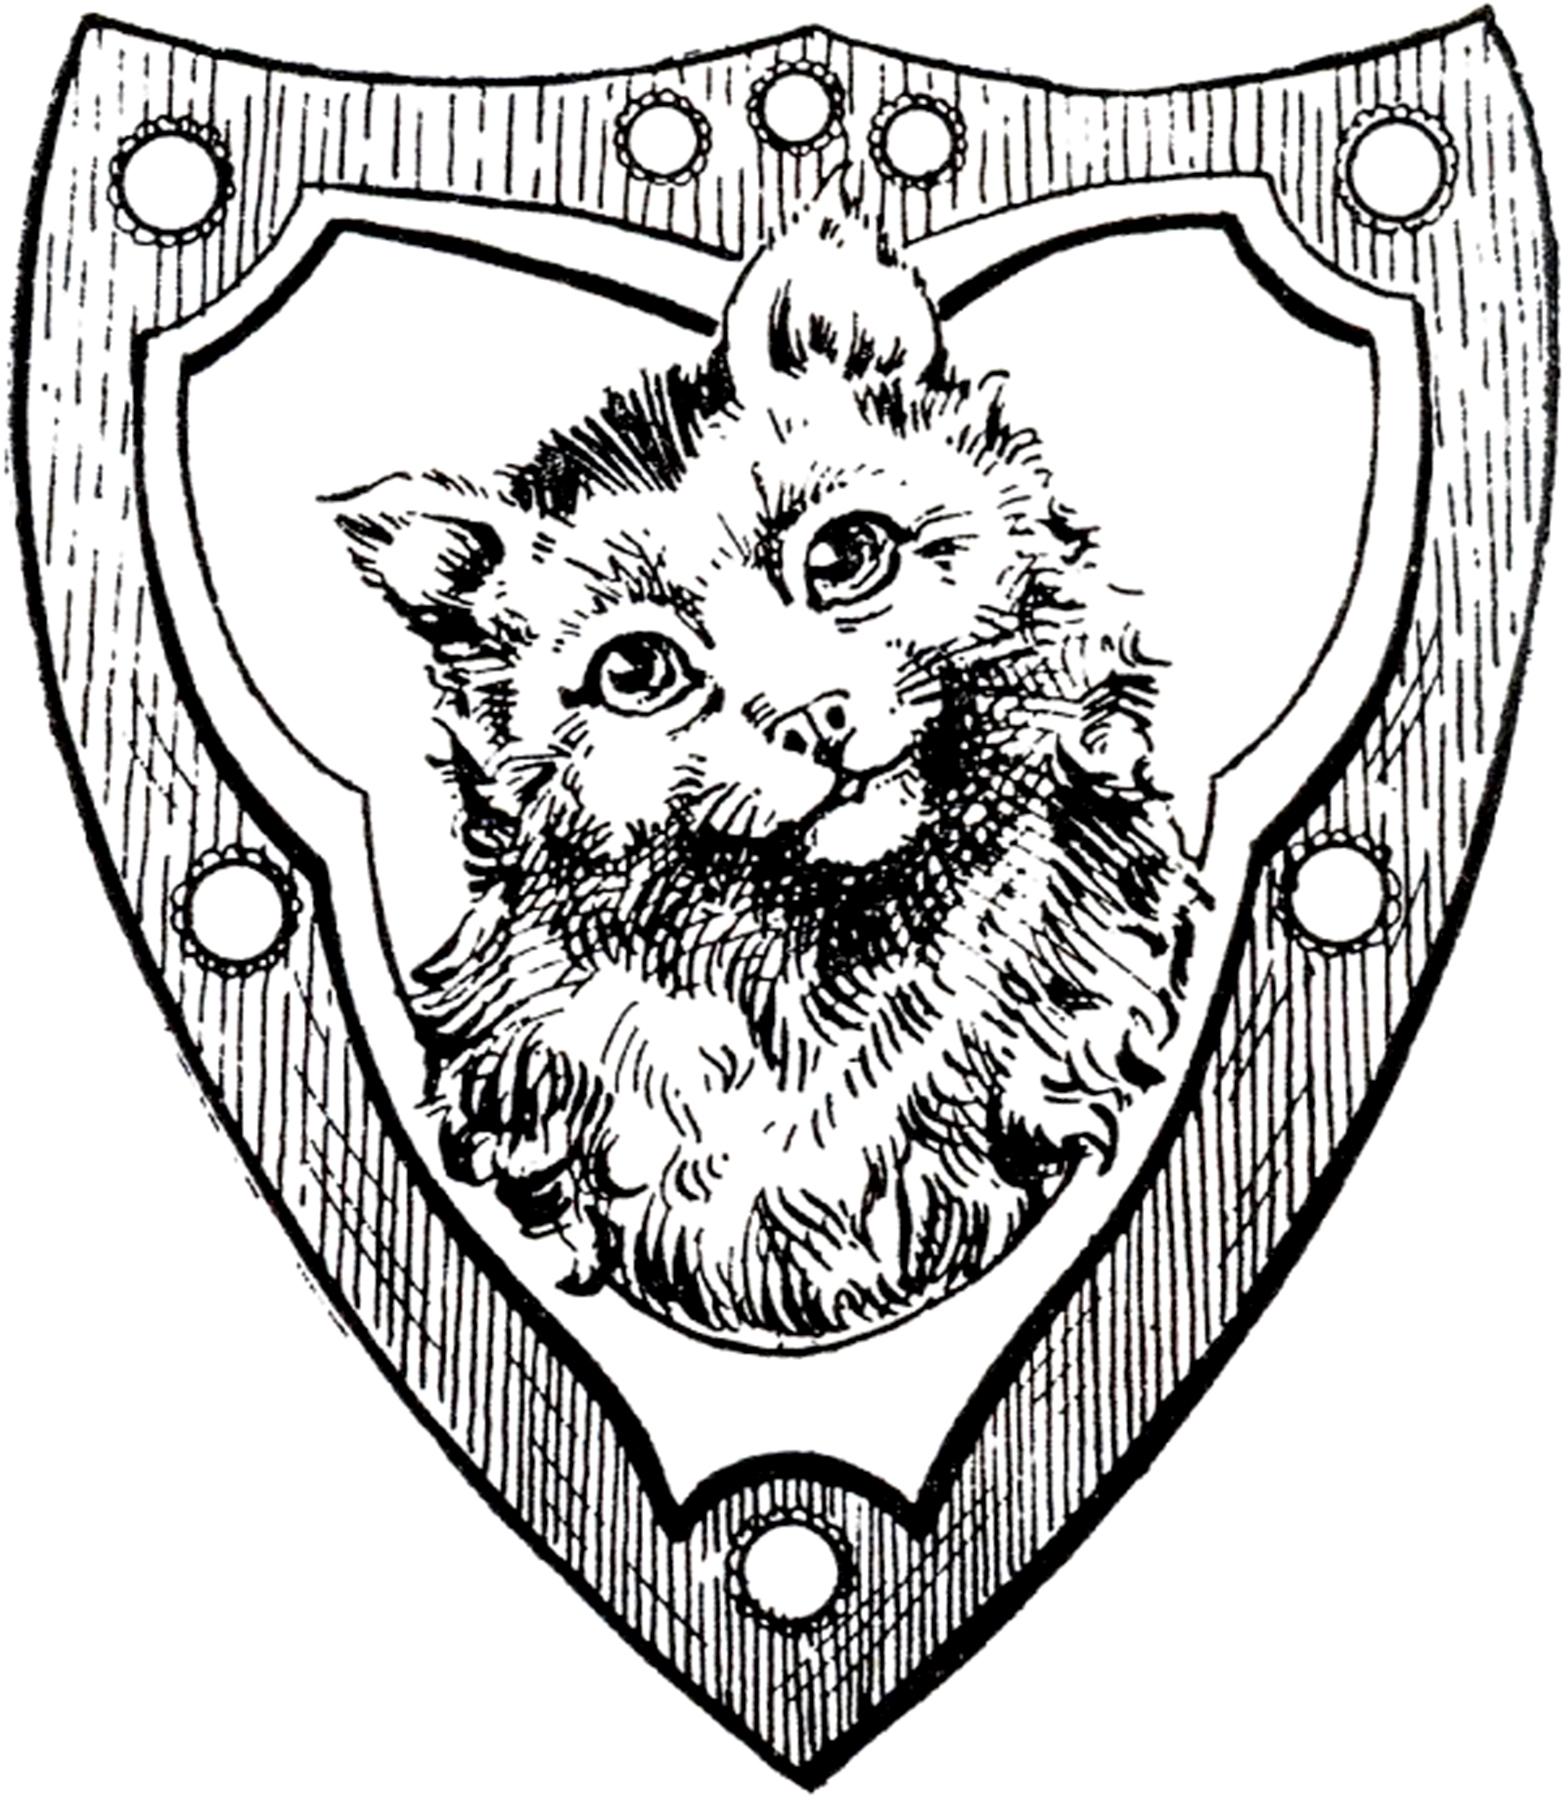 1568x1800 Vintage Cat Shield Image